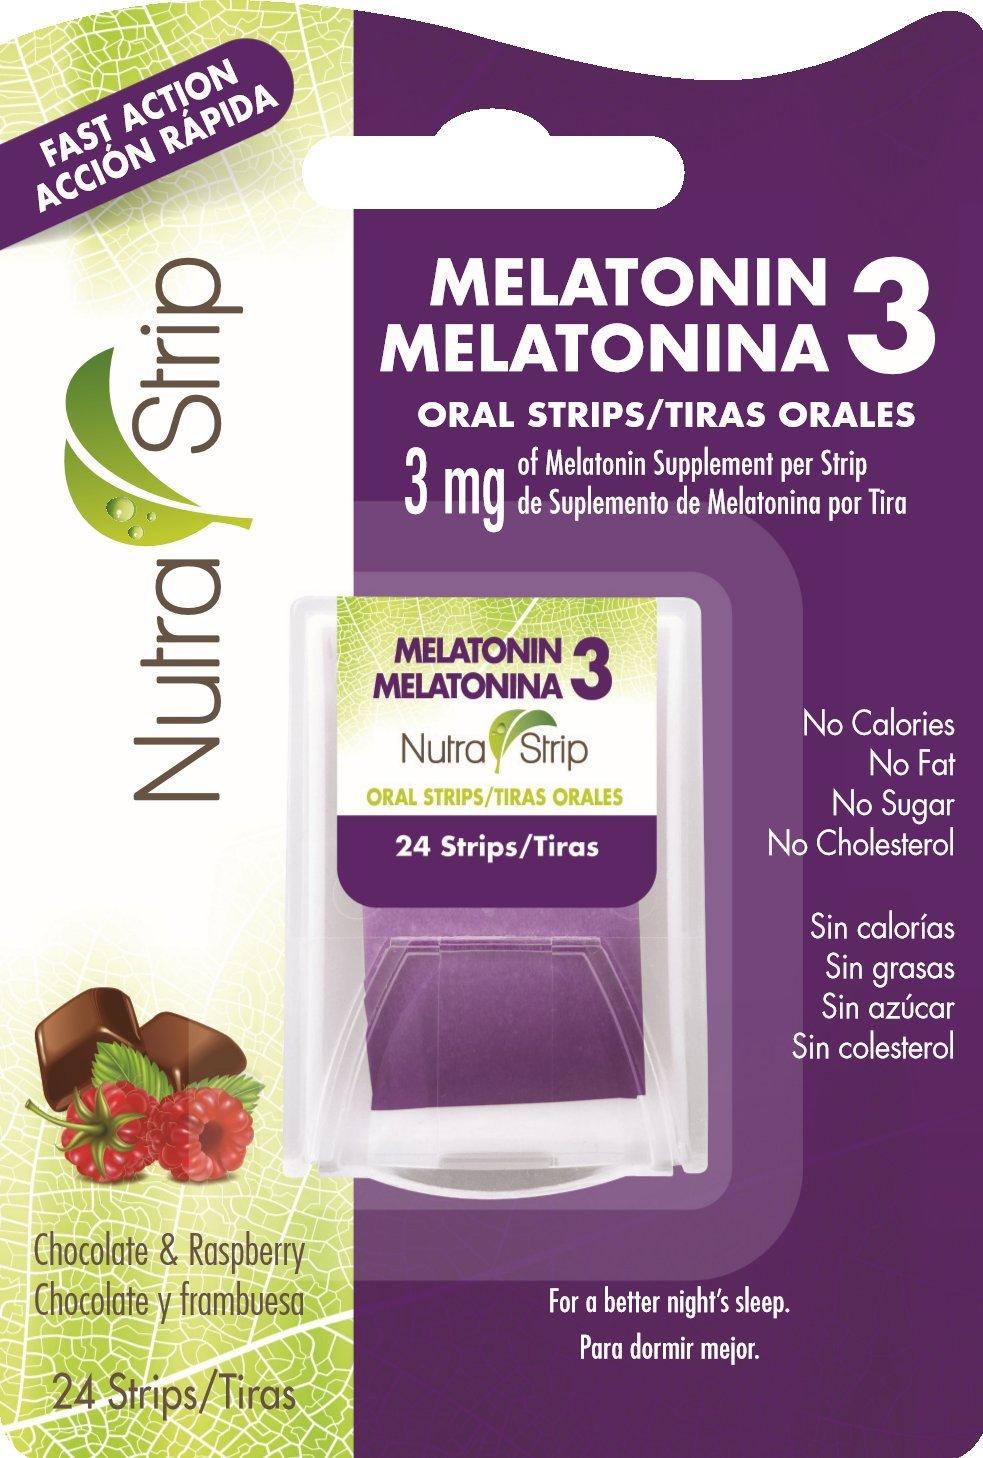 Amazon.com: Nutra-Strip Melatonin 3 / Melatonina 3 X10 Pack: Health & Personal Care